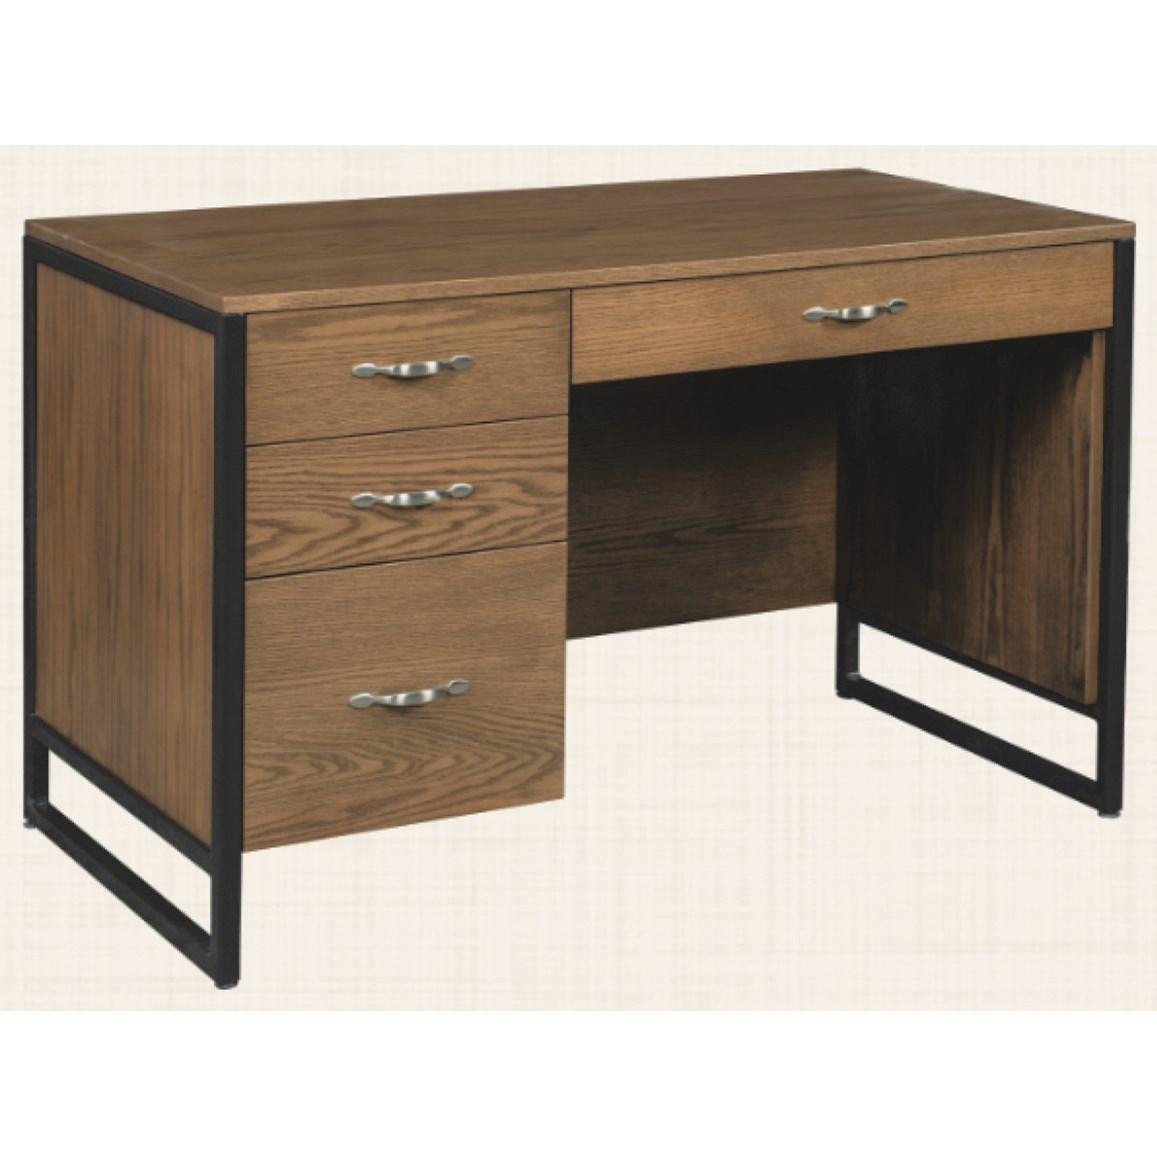 "Bridgeport 48"" Kneehole Desk by Maple Hill Woodworking at Saugerties Furniture Mart"